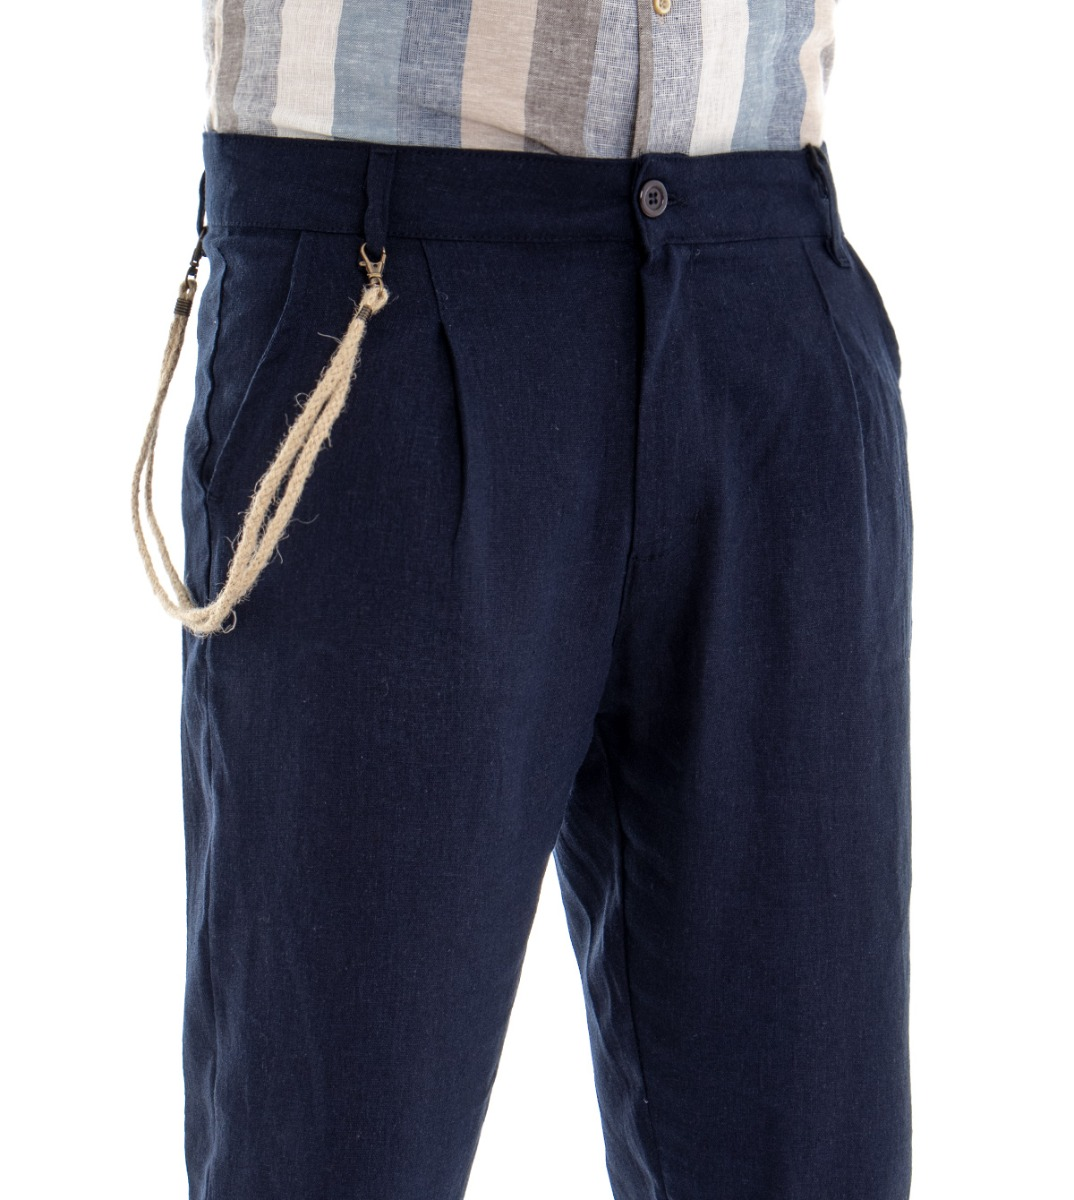 Pantalone-Uomo-Tinta-Unita-Blu-Tasca-America-Cavallo-Basso-Misto-Lino-Viscosa miniatura 4